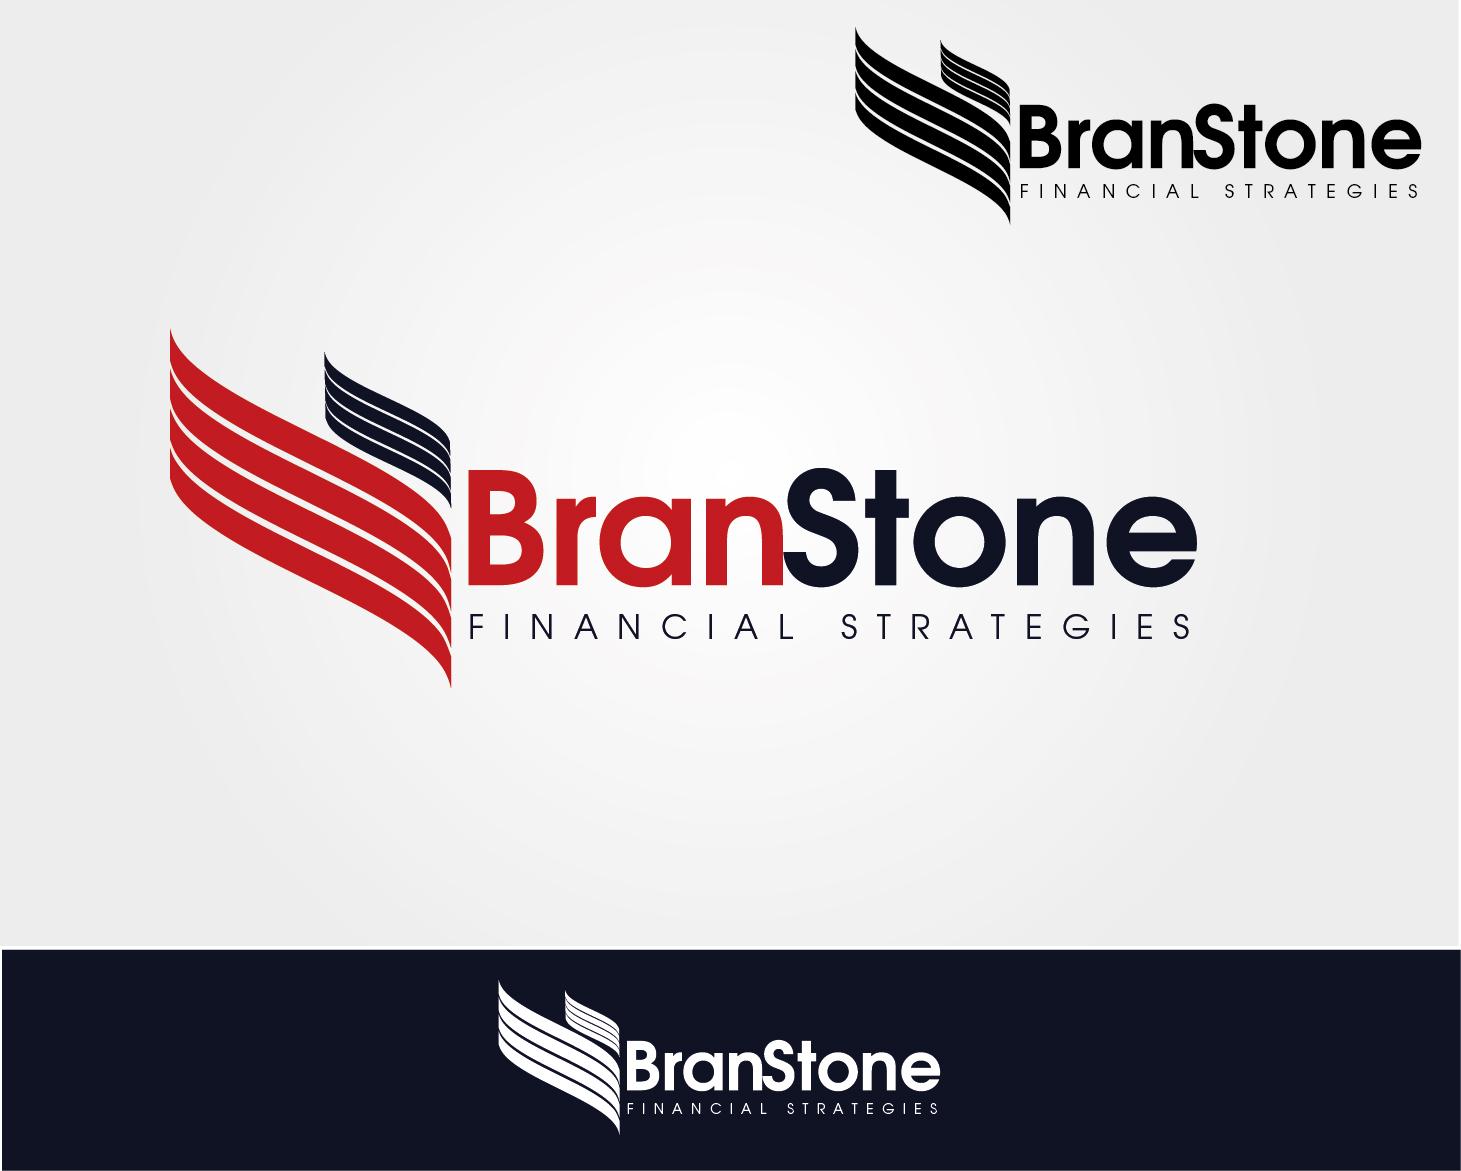 Logo Design by VENTSISLAV KOVACHEV - Entry No. 49 in the Logo Design Contest Inspiring Logo Design for Branstone Financial Strategies.